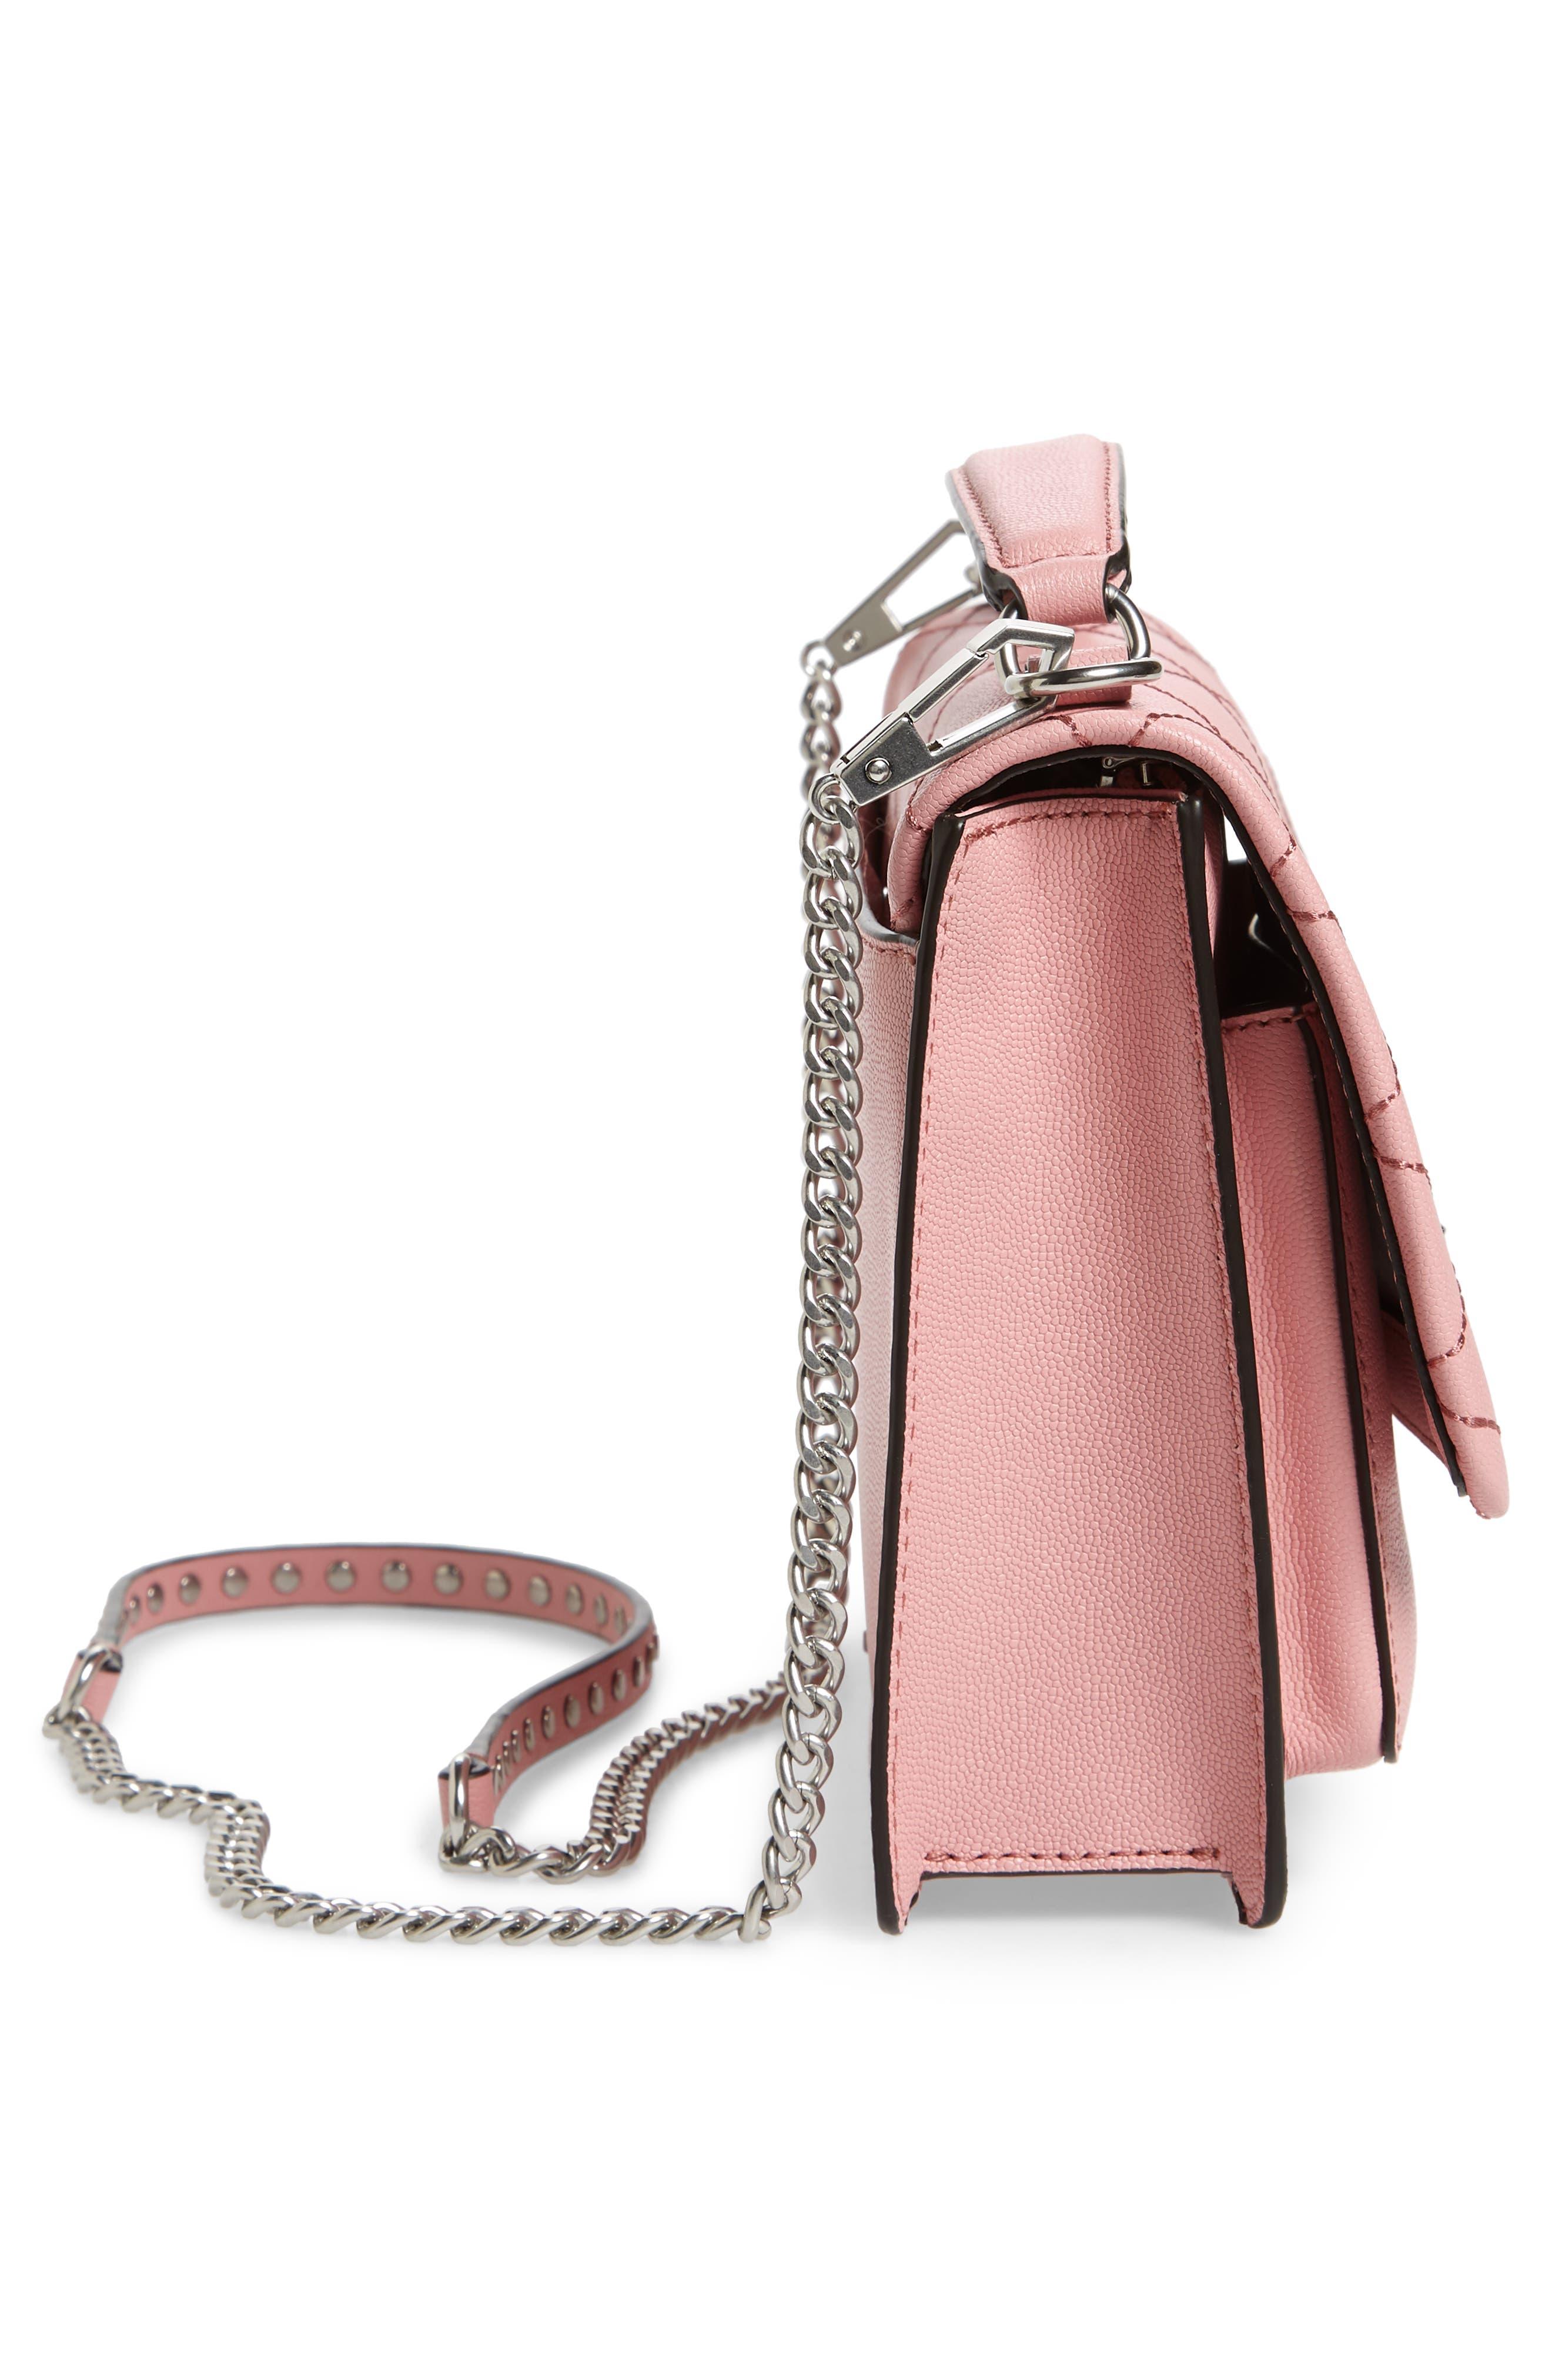 Medium Je T'aime Convertible Leather Crossbody Bag,                             Alternate thumbnail 49, color,